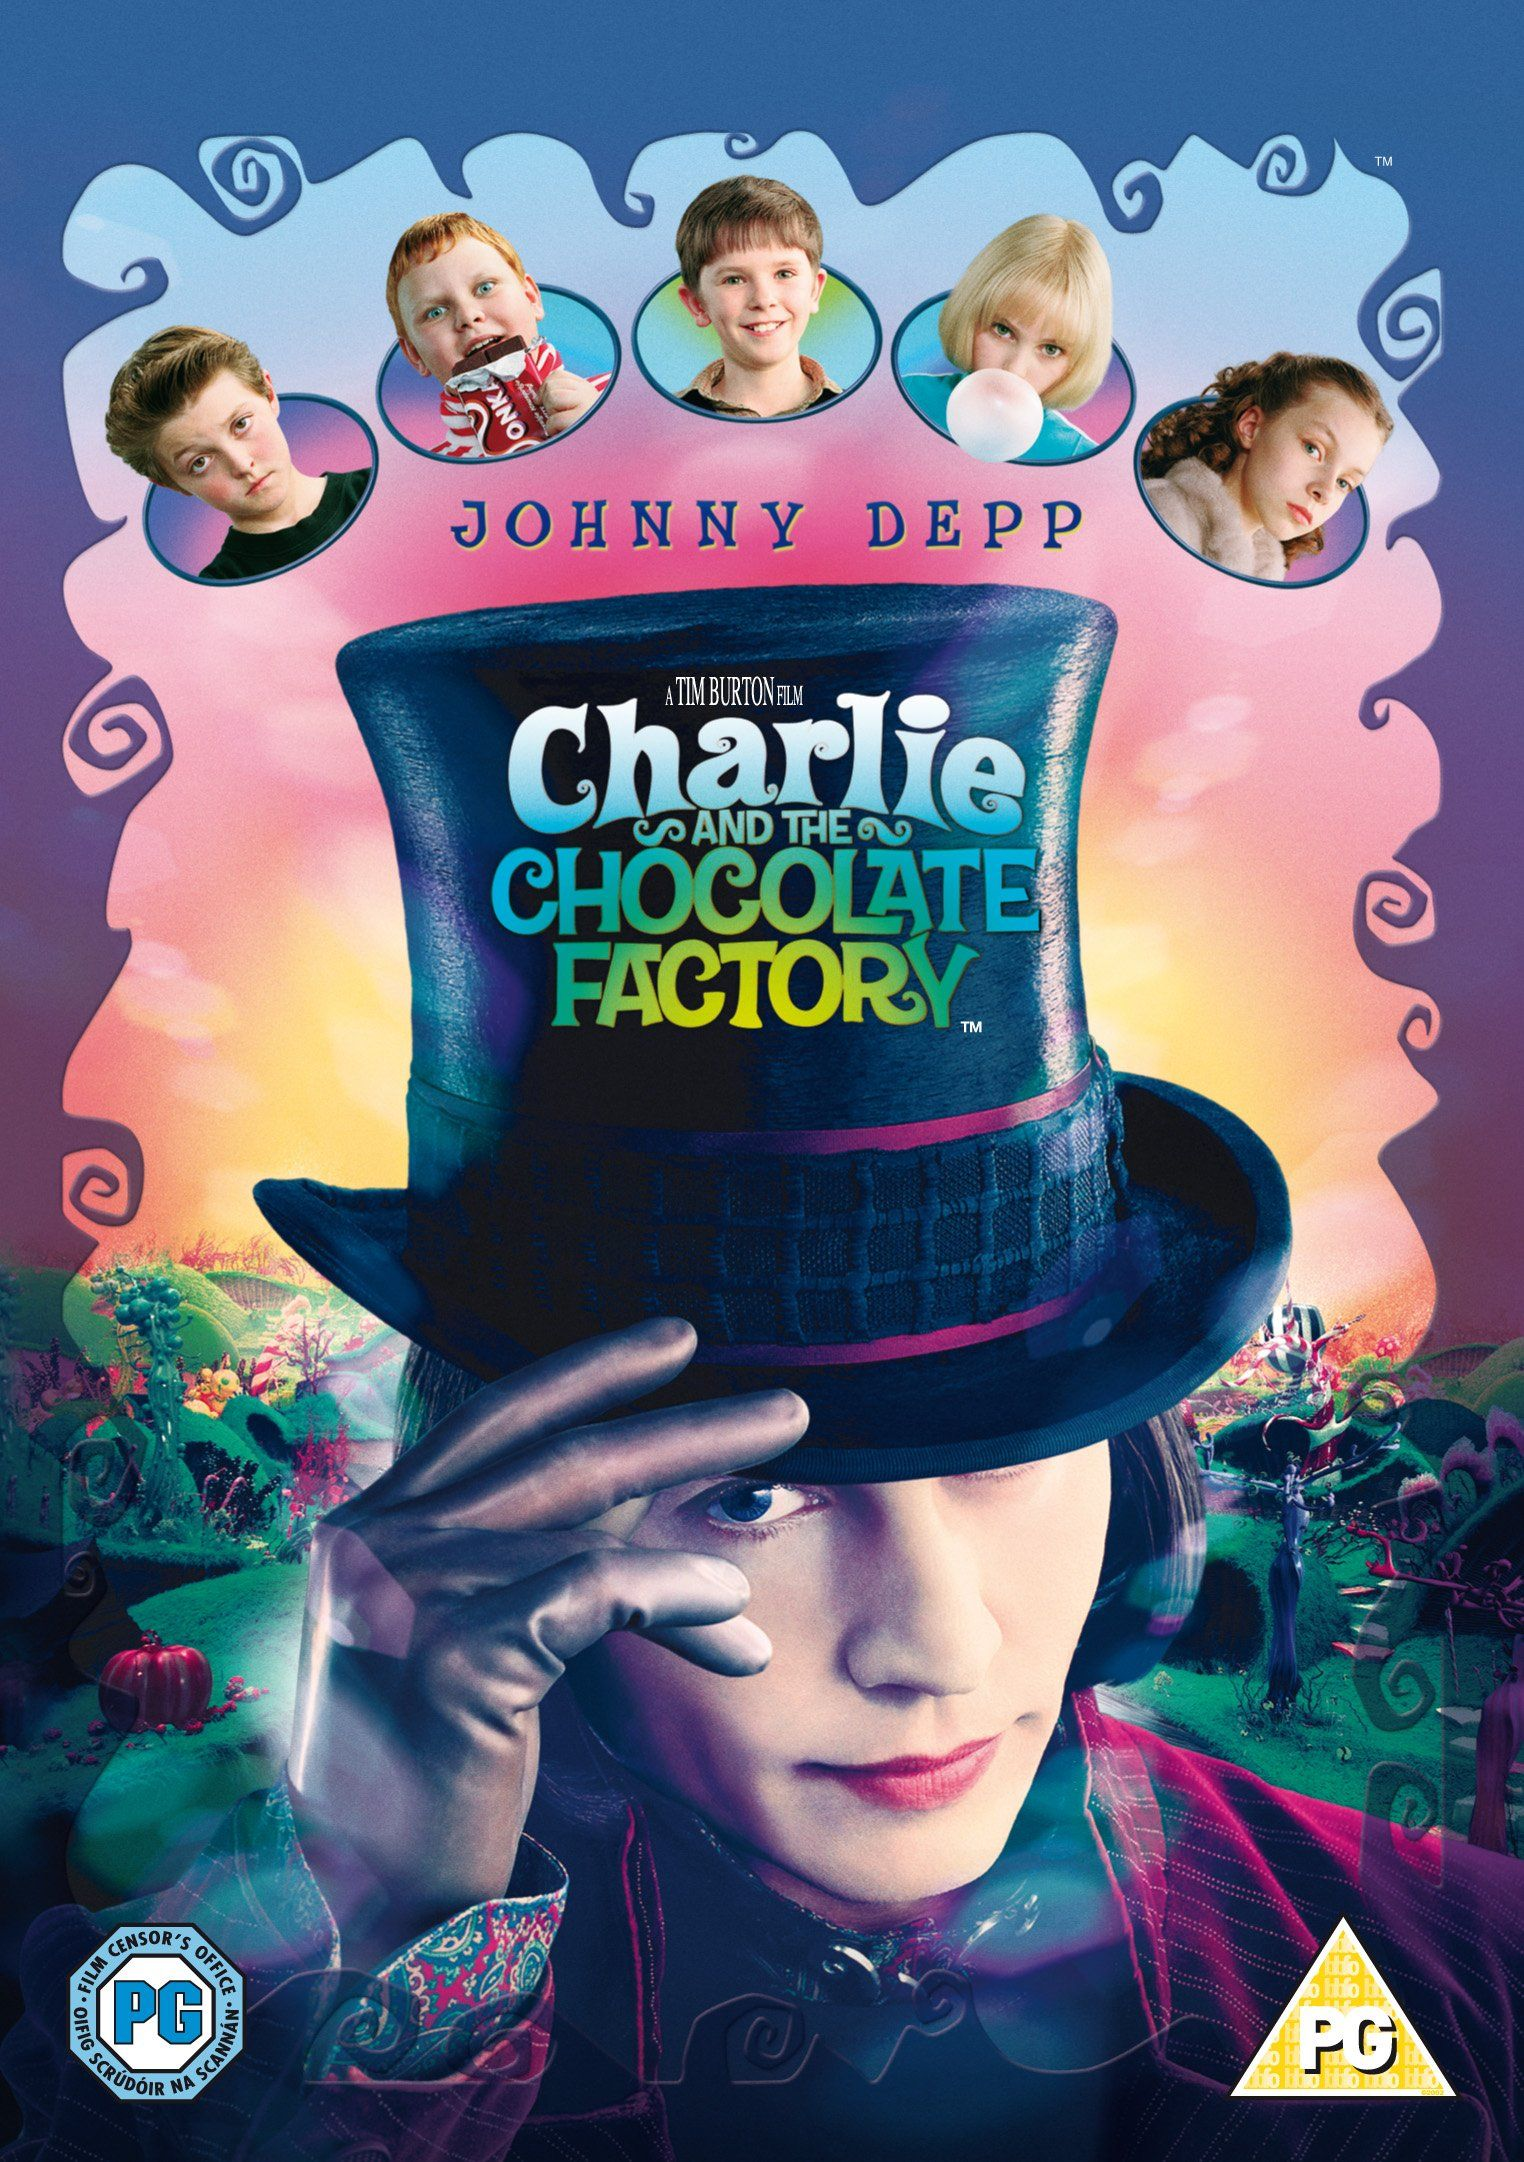 Charlie And The Chocolate Factory Edizione Regno Unito Reino Unido Dvd Factory Edizione Charlie Y La Fabrica De Chocolate Johnny Depp Fábrica De Chocolate